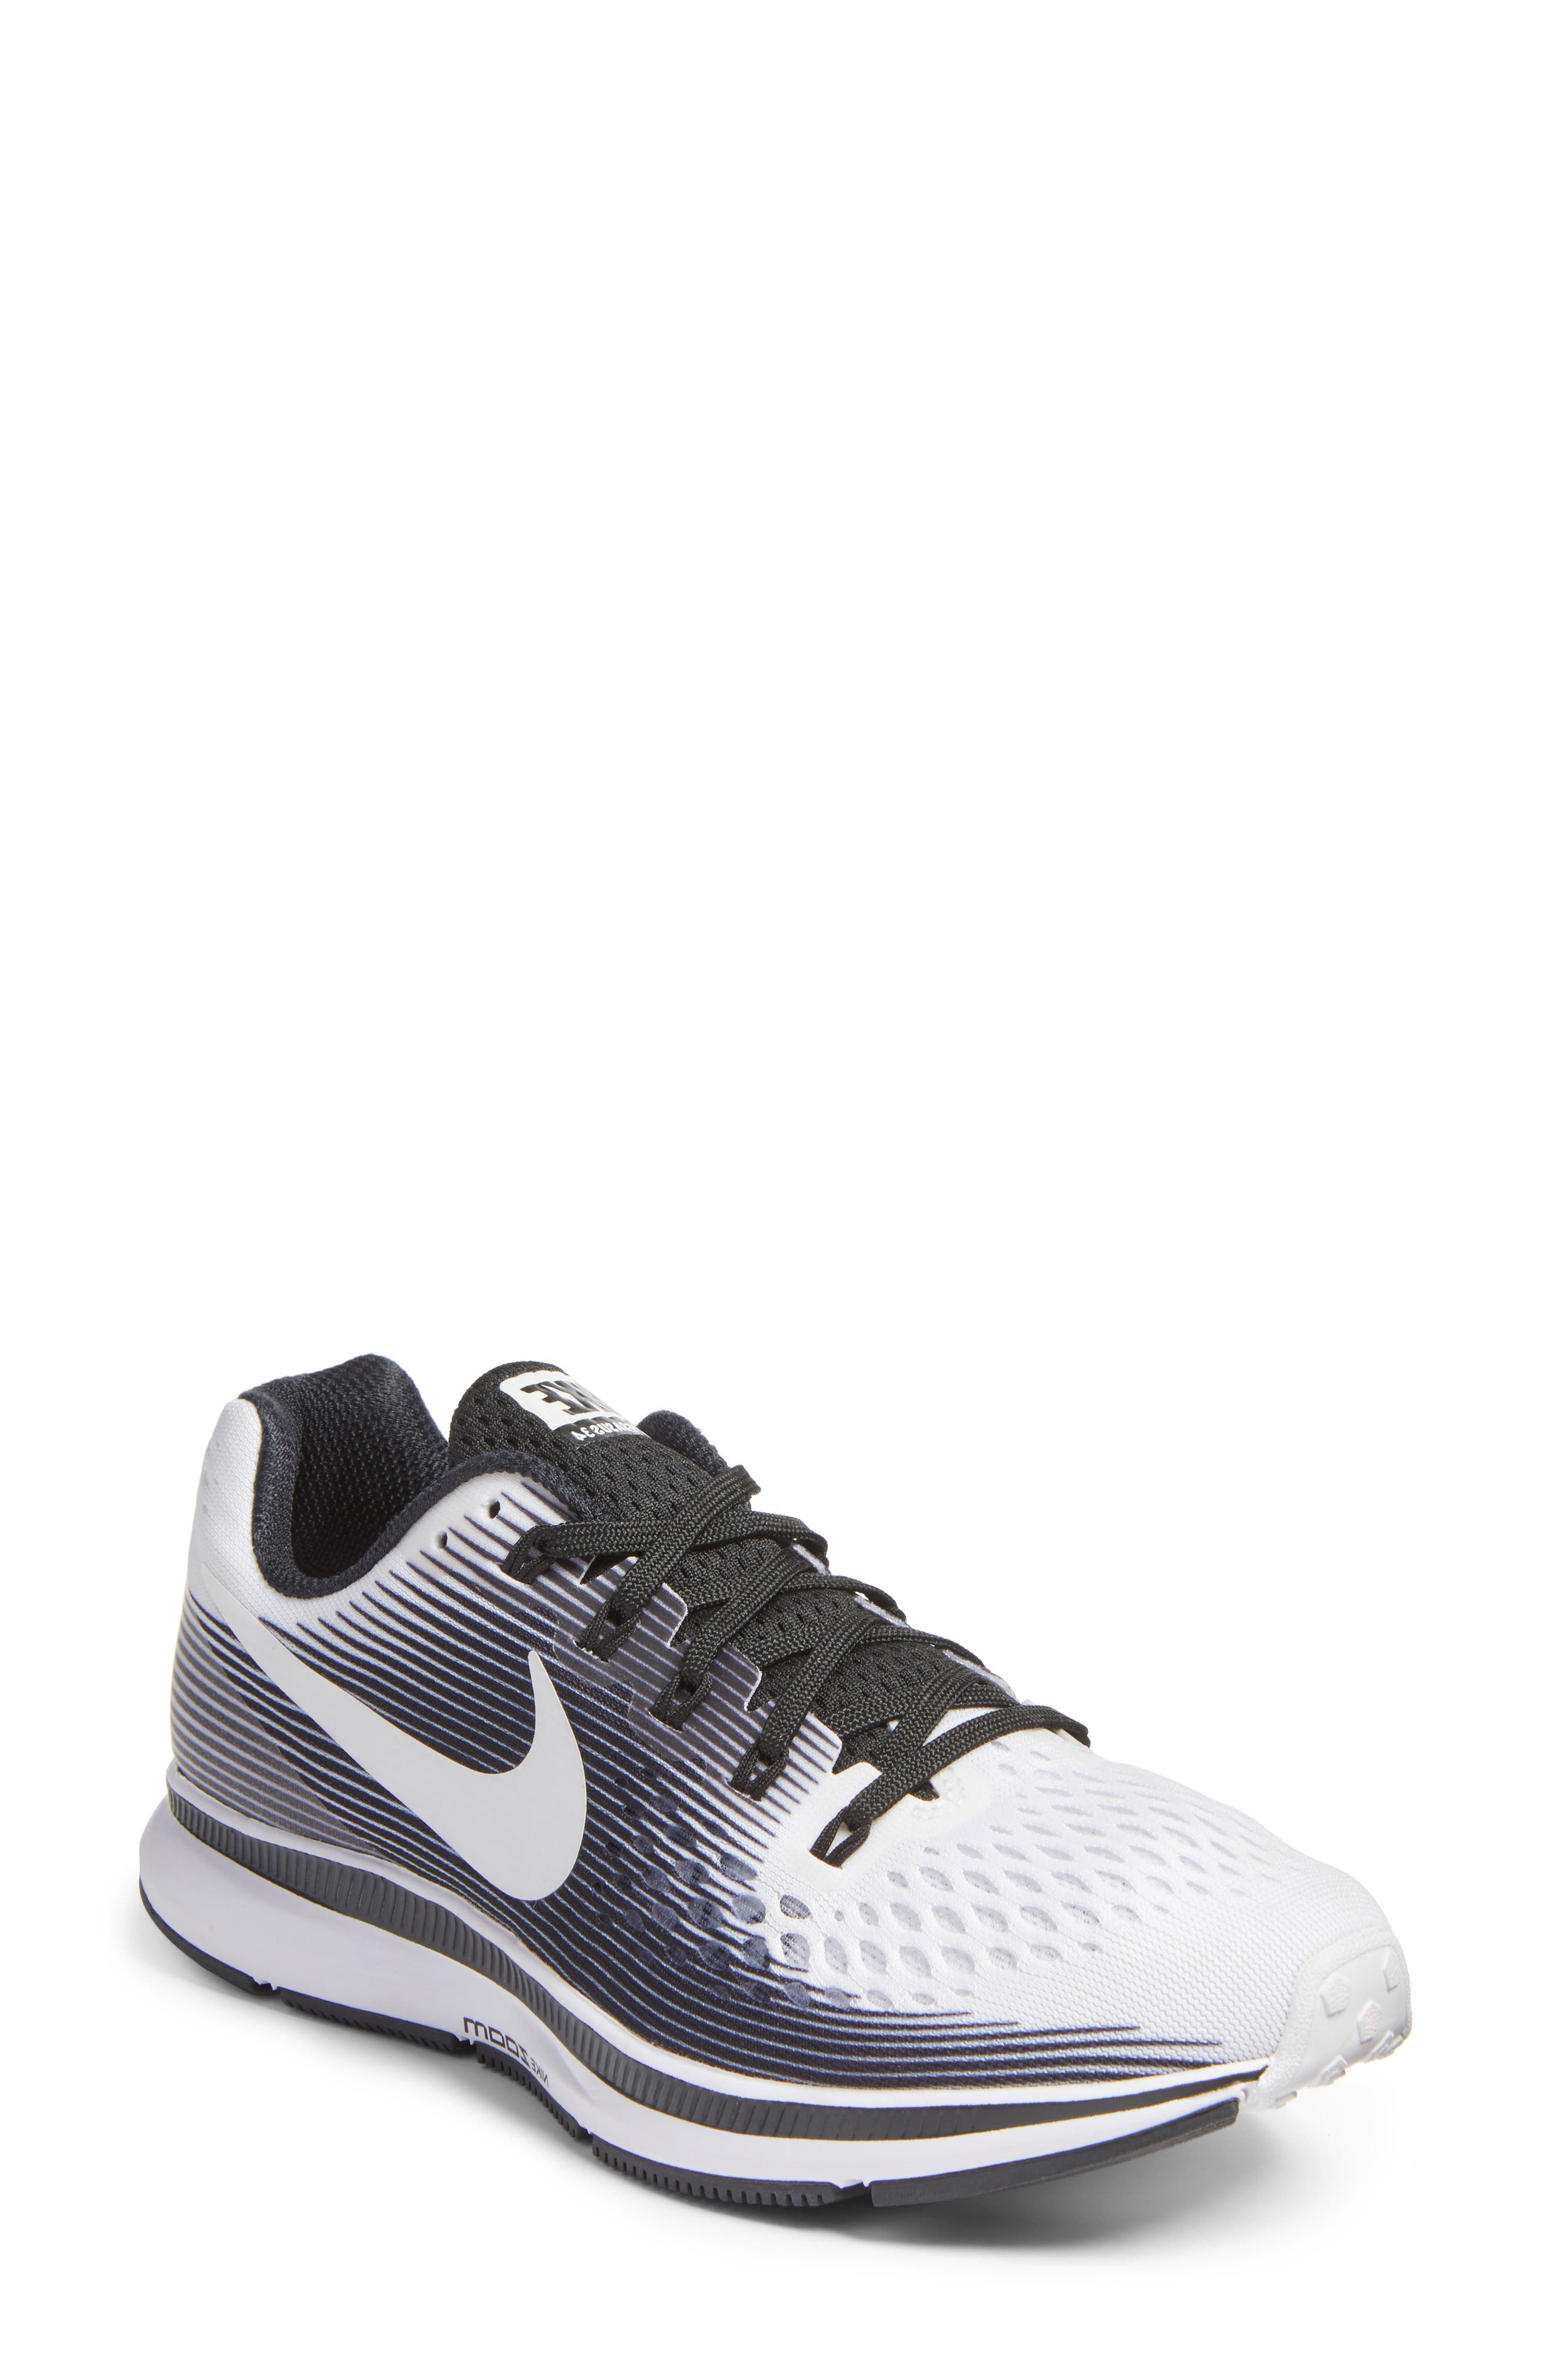 Air Zoom Pegasus 34 LE Running Shoe,                             Main thumbnail 1, color,                             White/ White/ Black